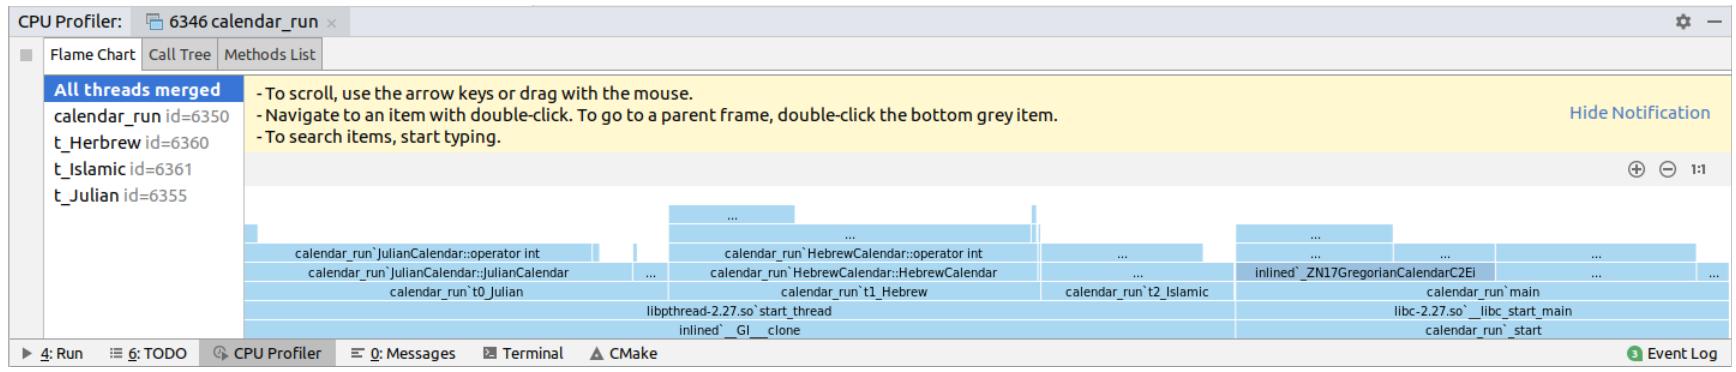 profiler tool window on linux